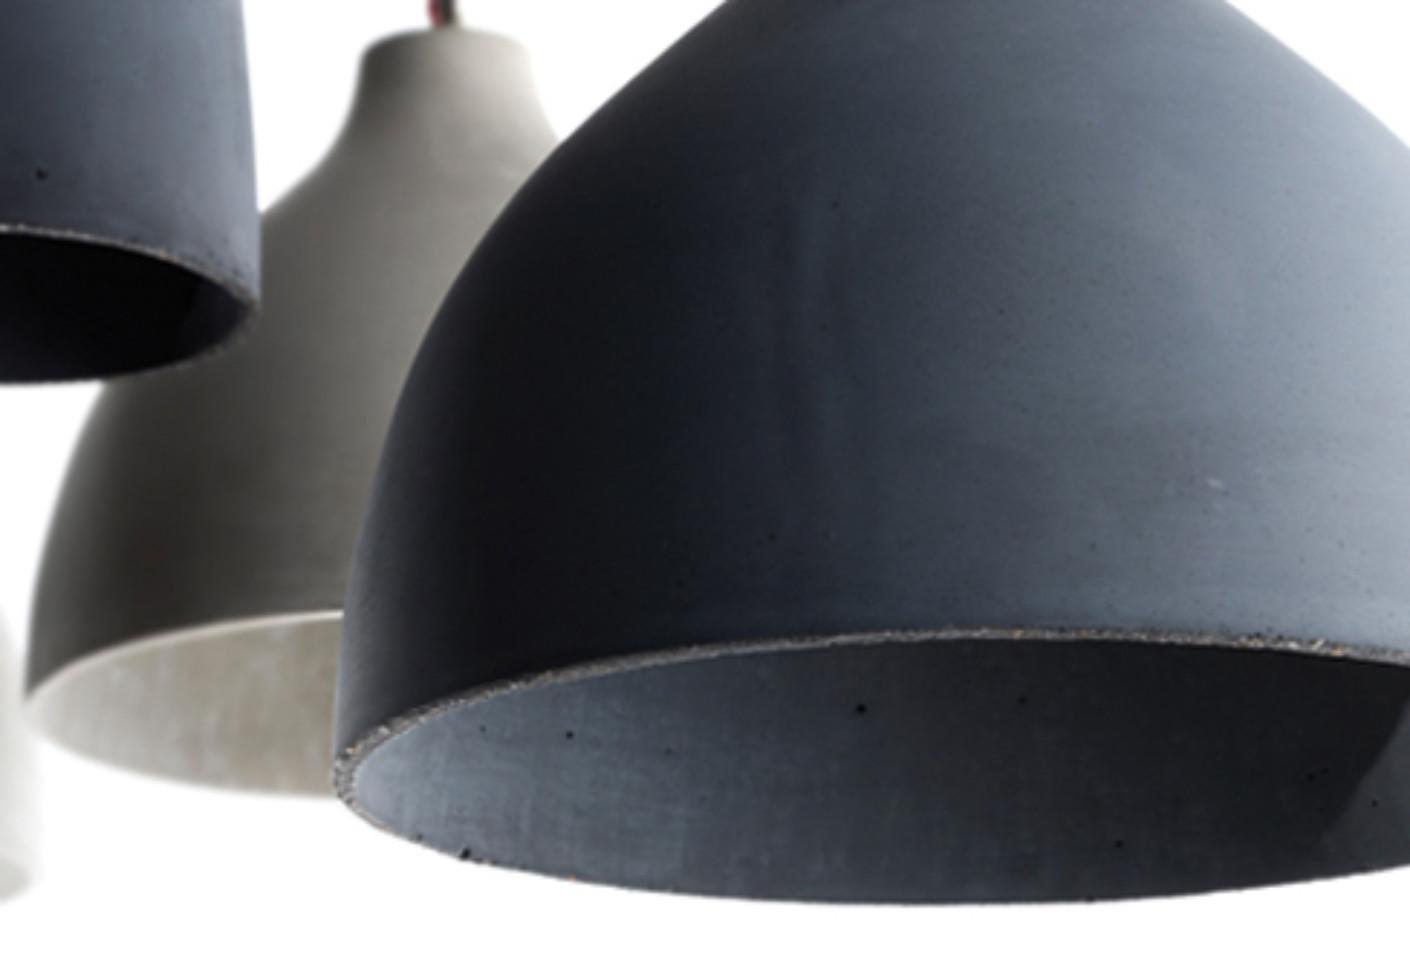 Heavy Light Ceiling Lamp By Decode Stylepark